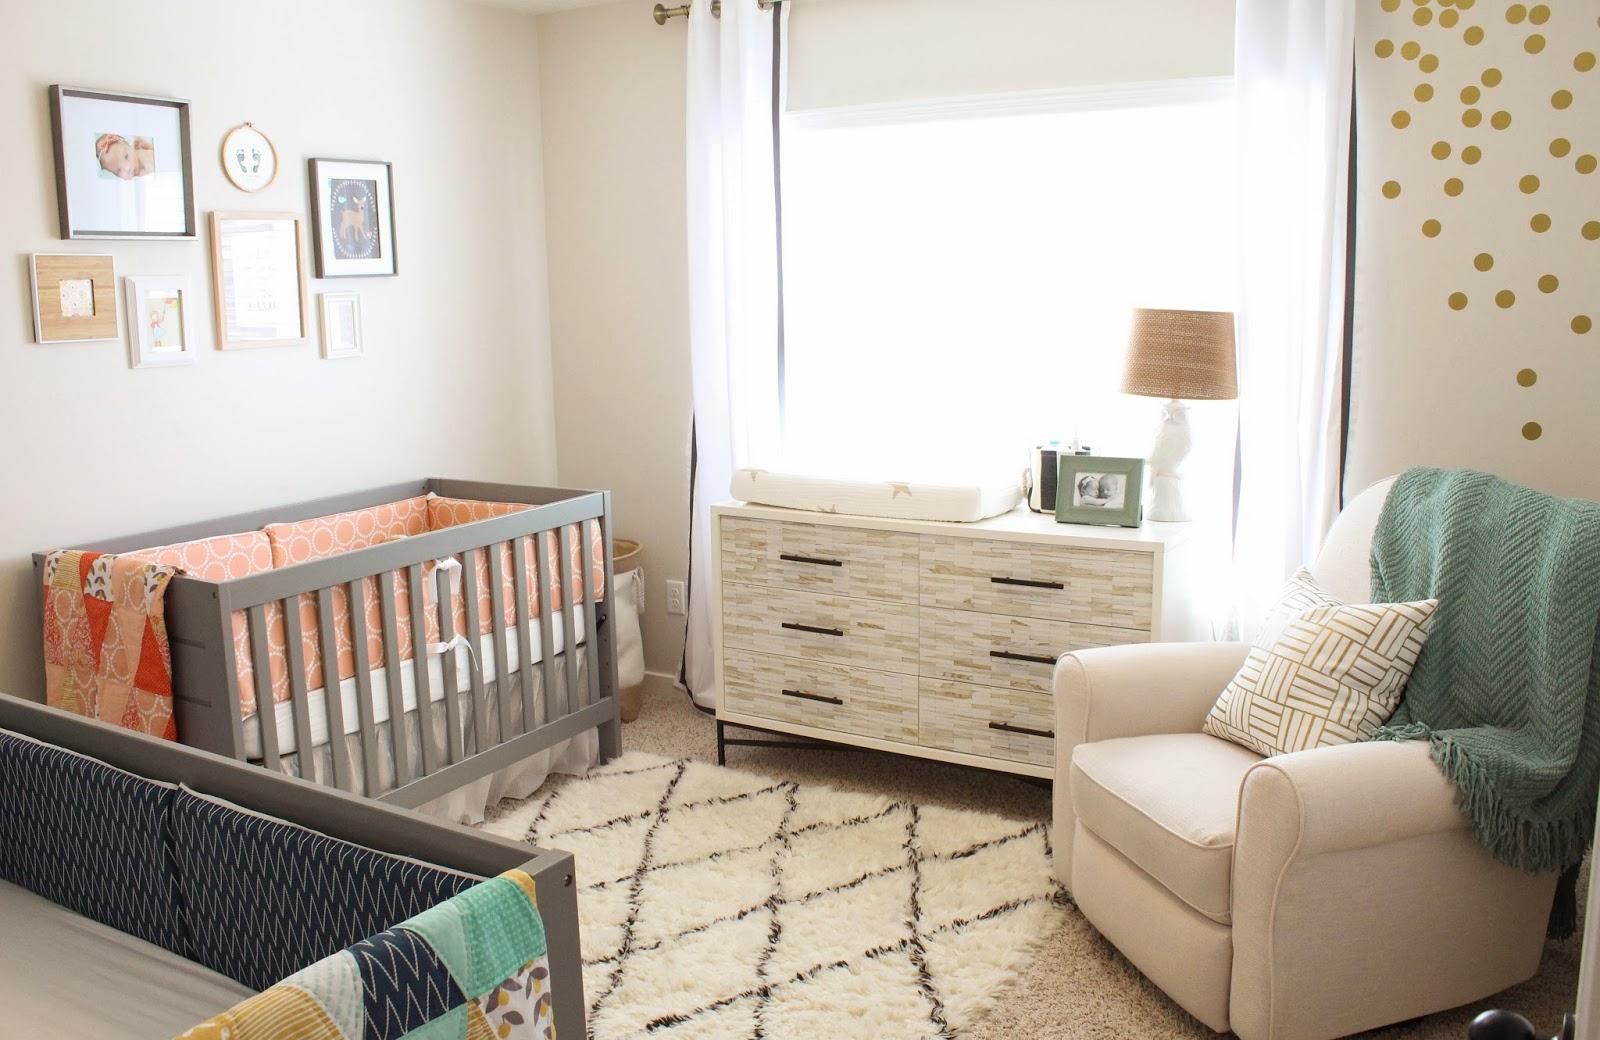 Nursery decor in 4 easy steps nursery ideas latina - Neutral baby bedroom ideas ...